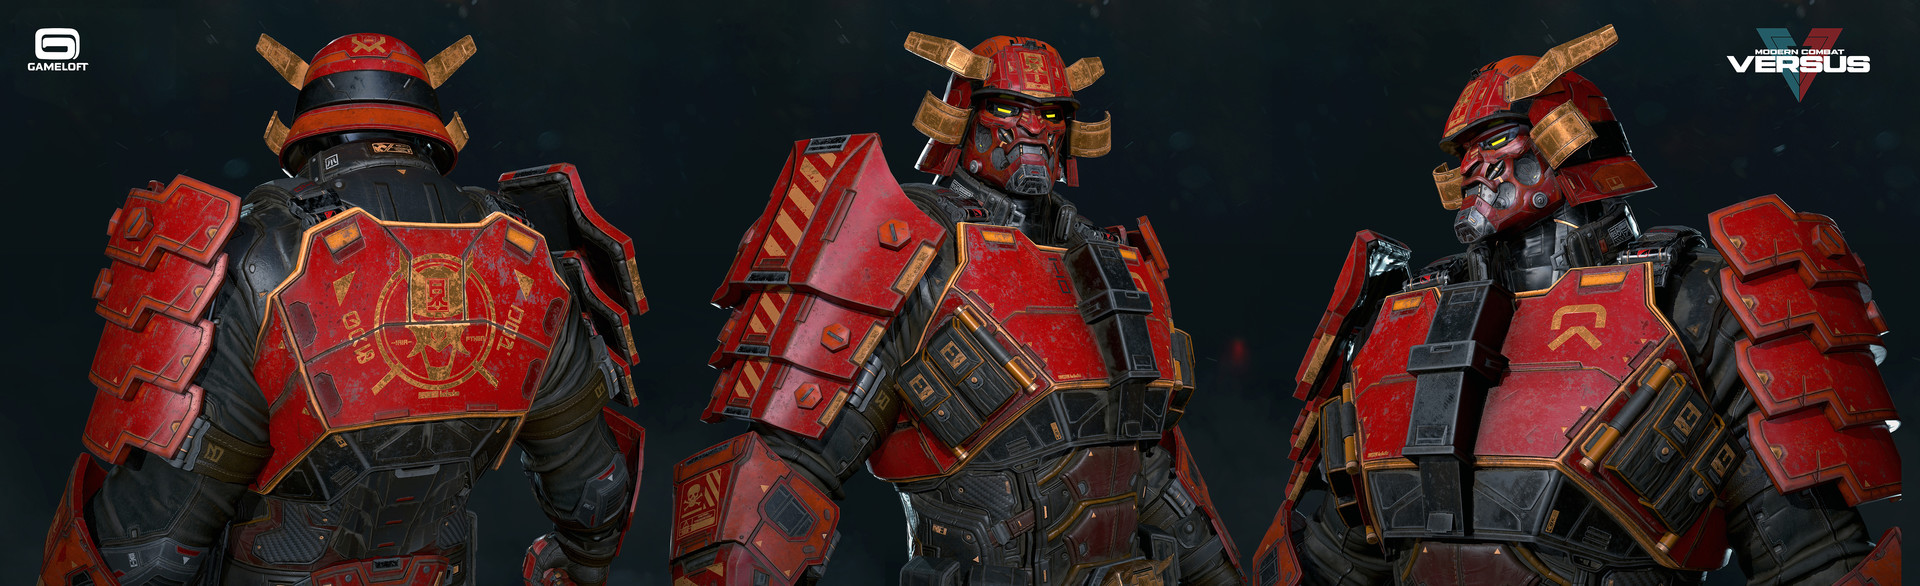 Rodrigue Pralier Ronen Modern Combat Versus Gameloft